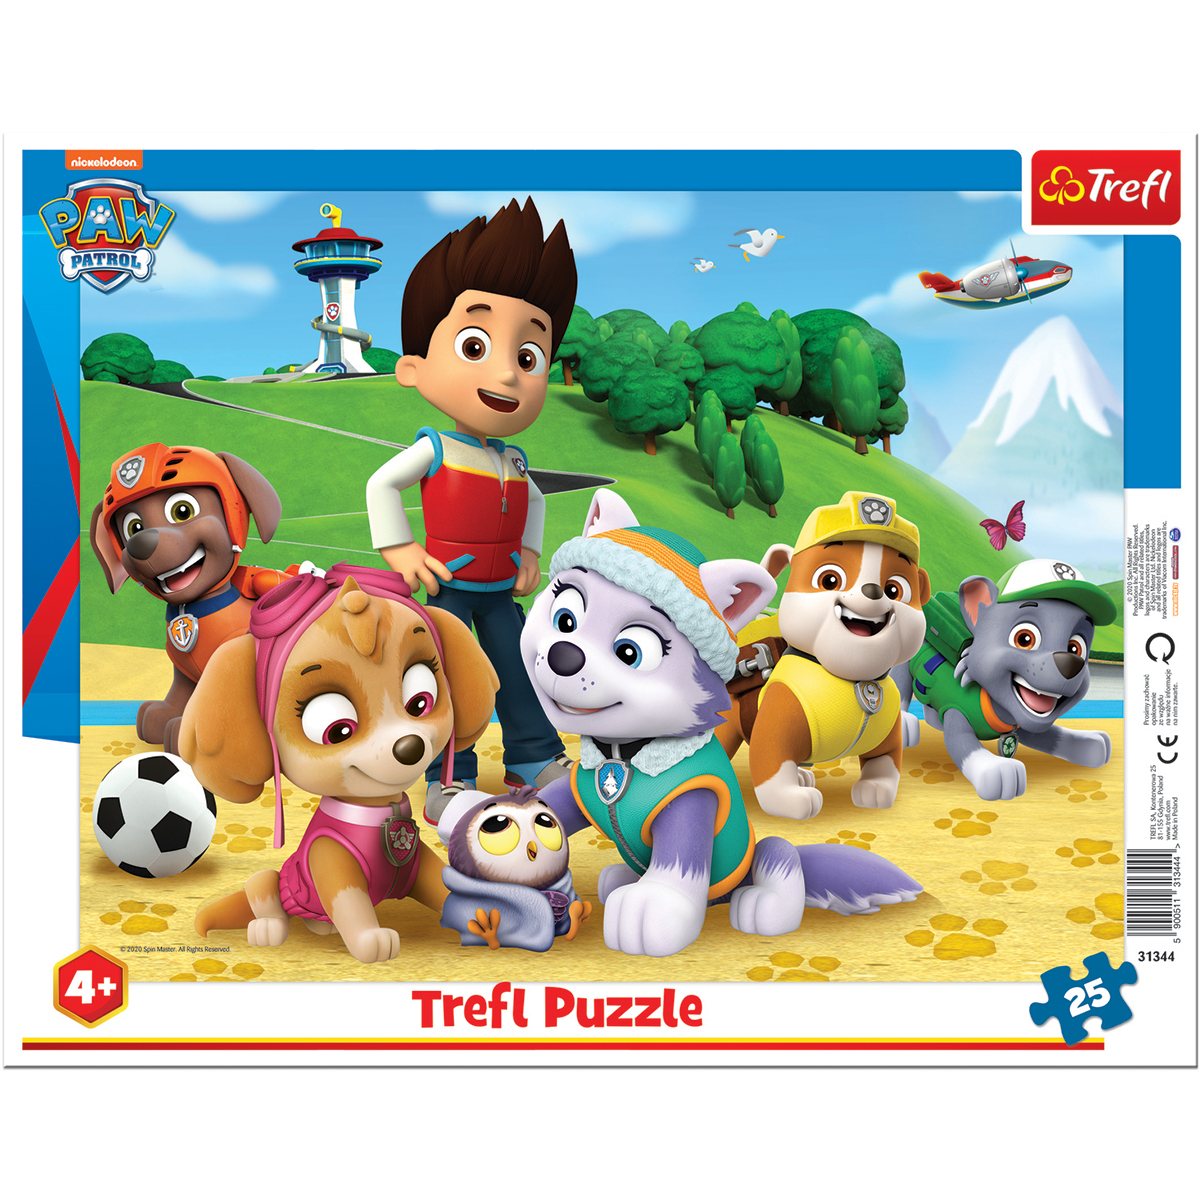 Puzzle Trefl 25 piese in rama, Adulmecand urmele, Paw Patrol